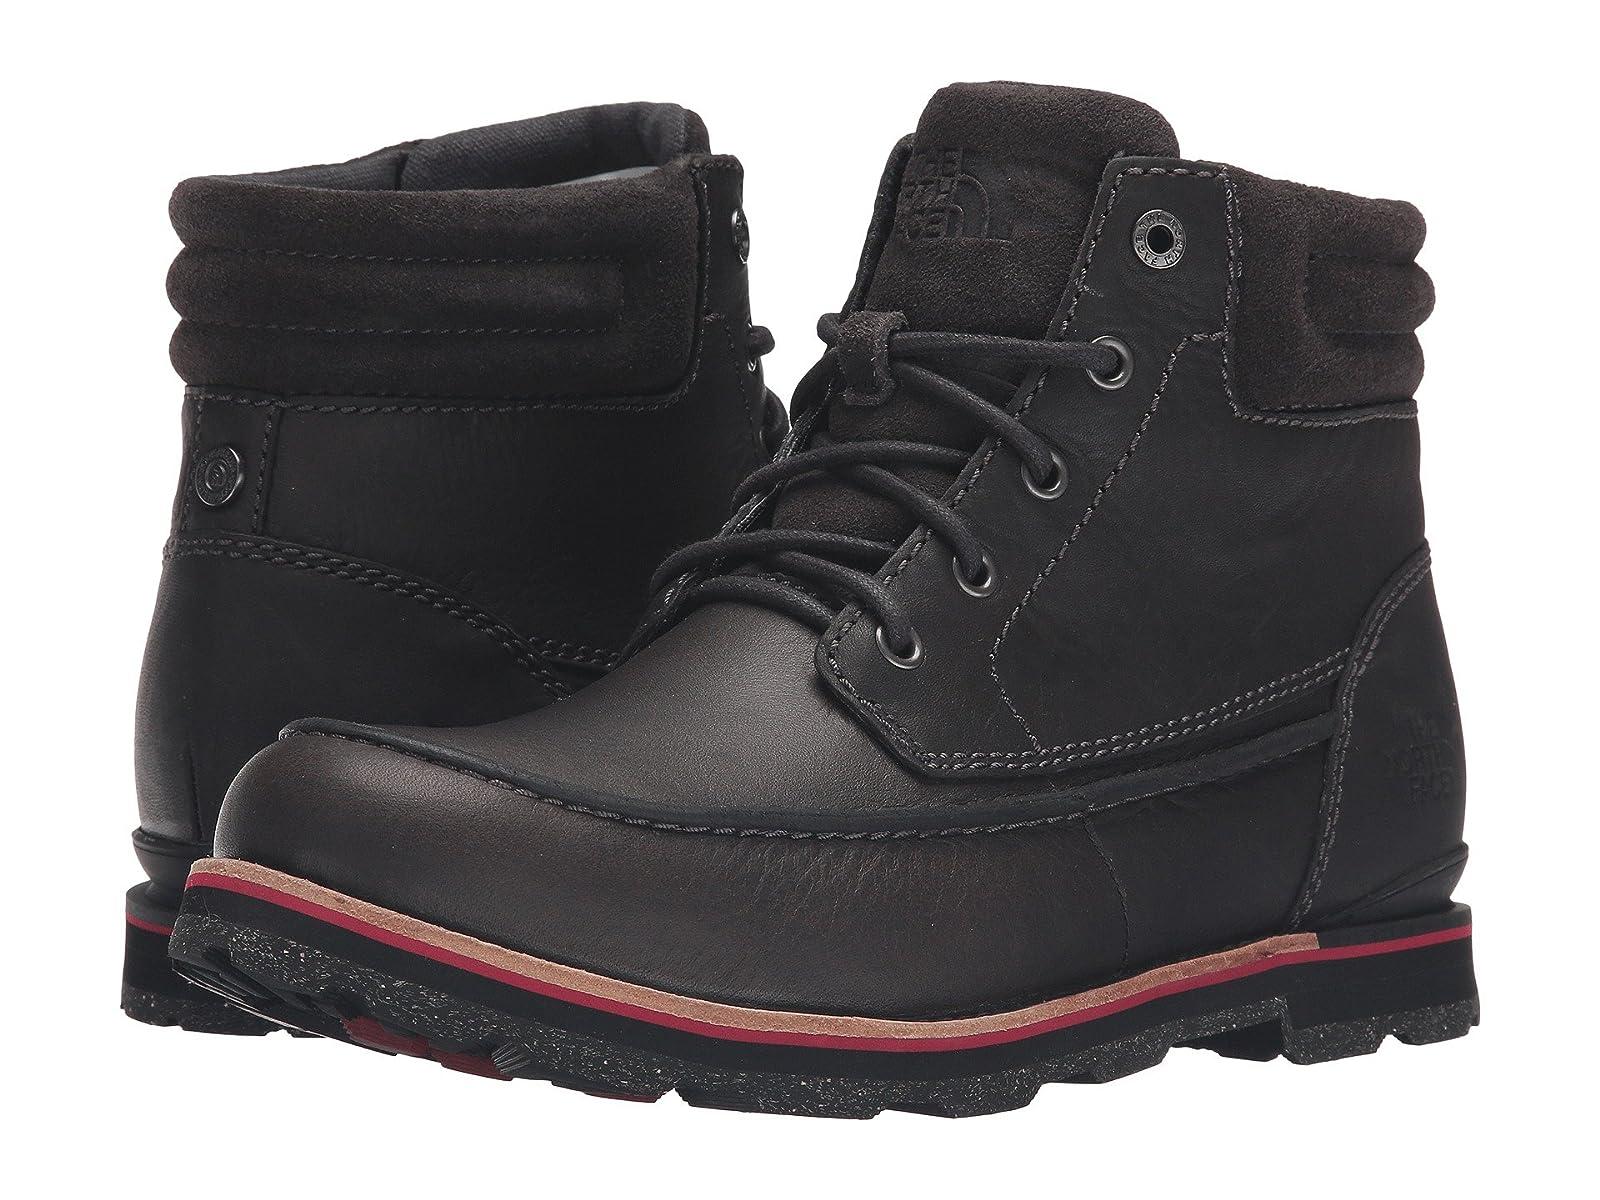 The North Face Bridgeton ChukkaCheap and distinctive eye-catching shoes